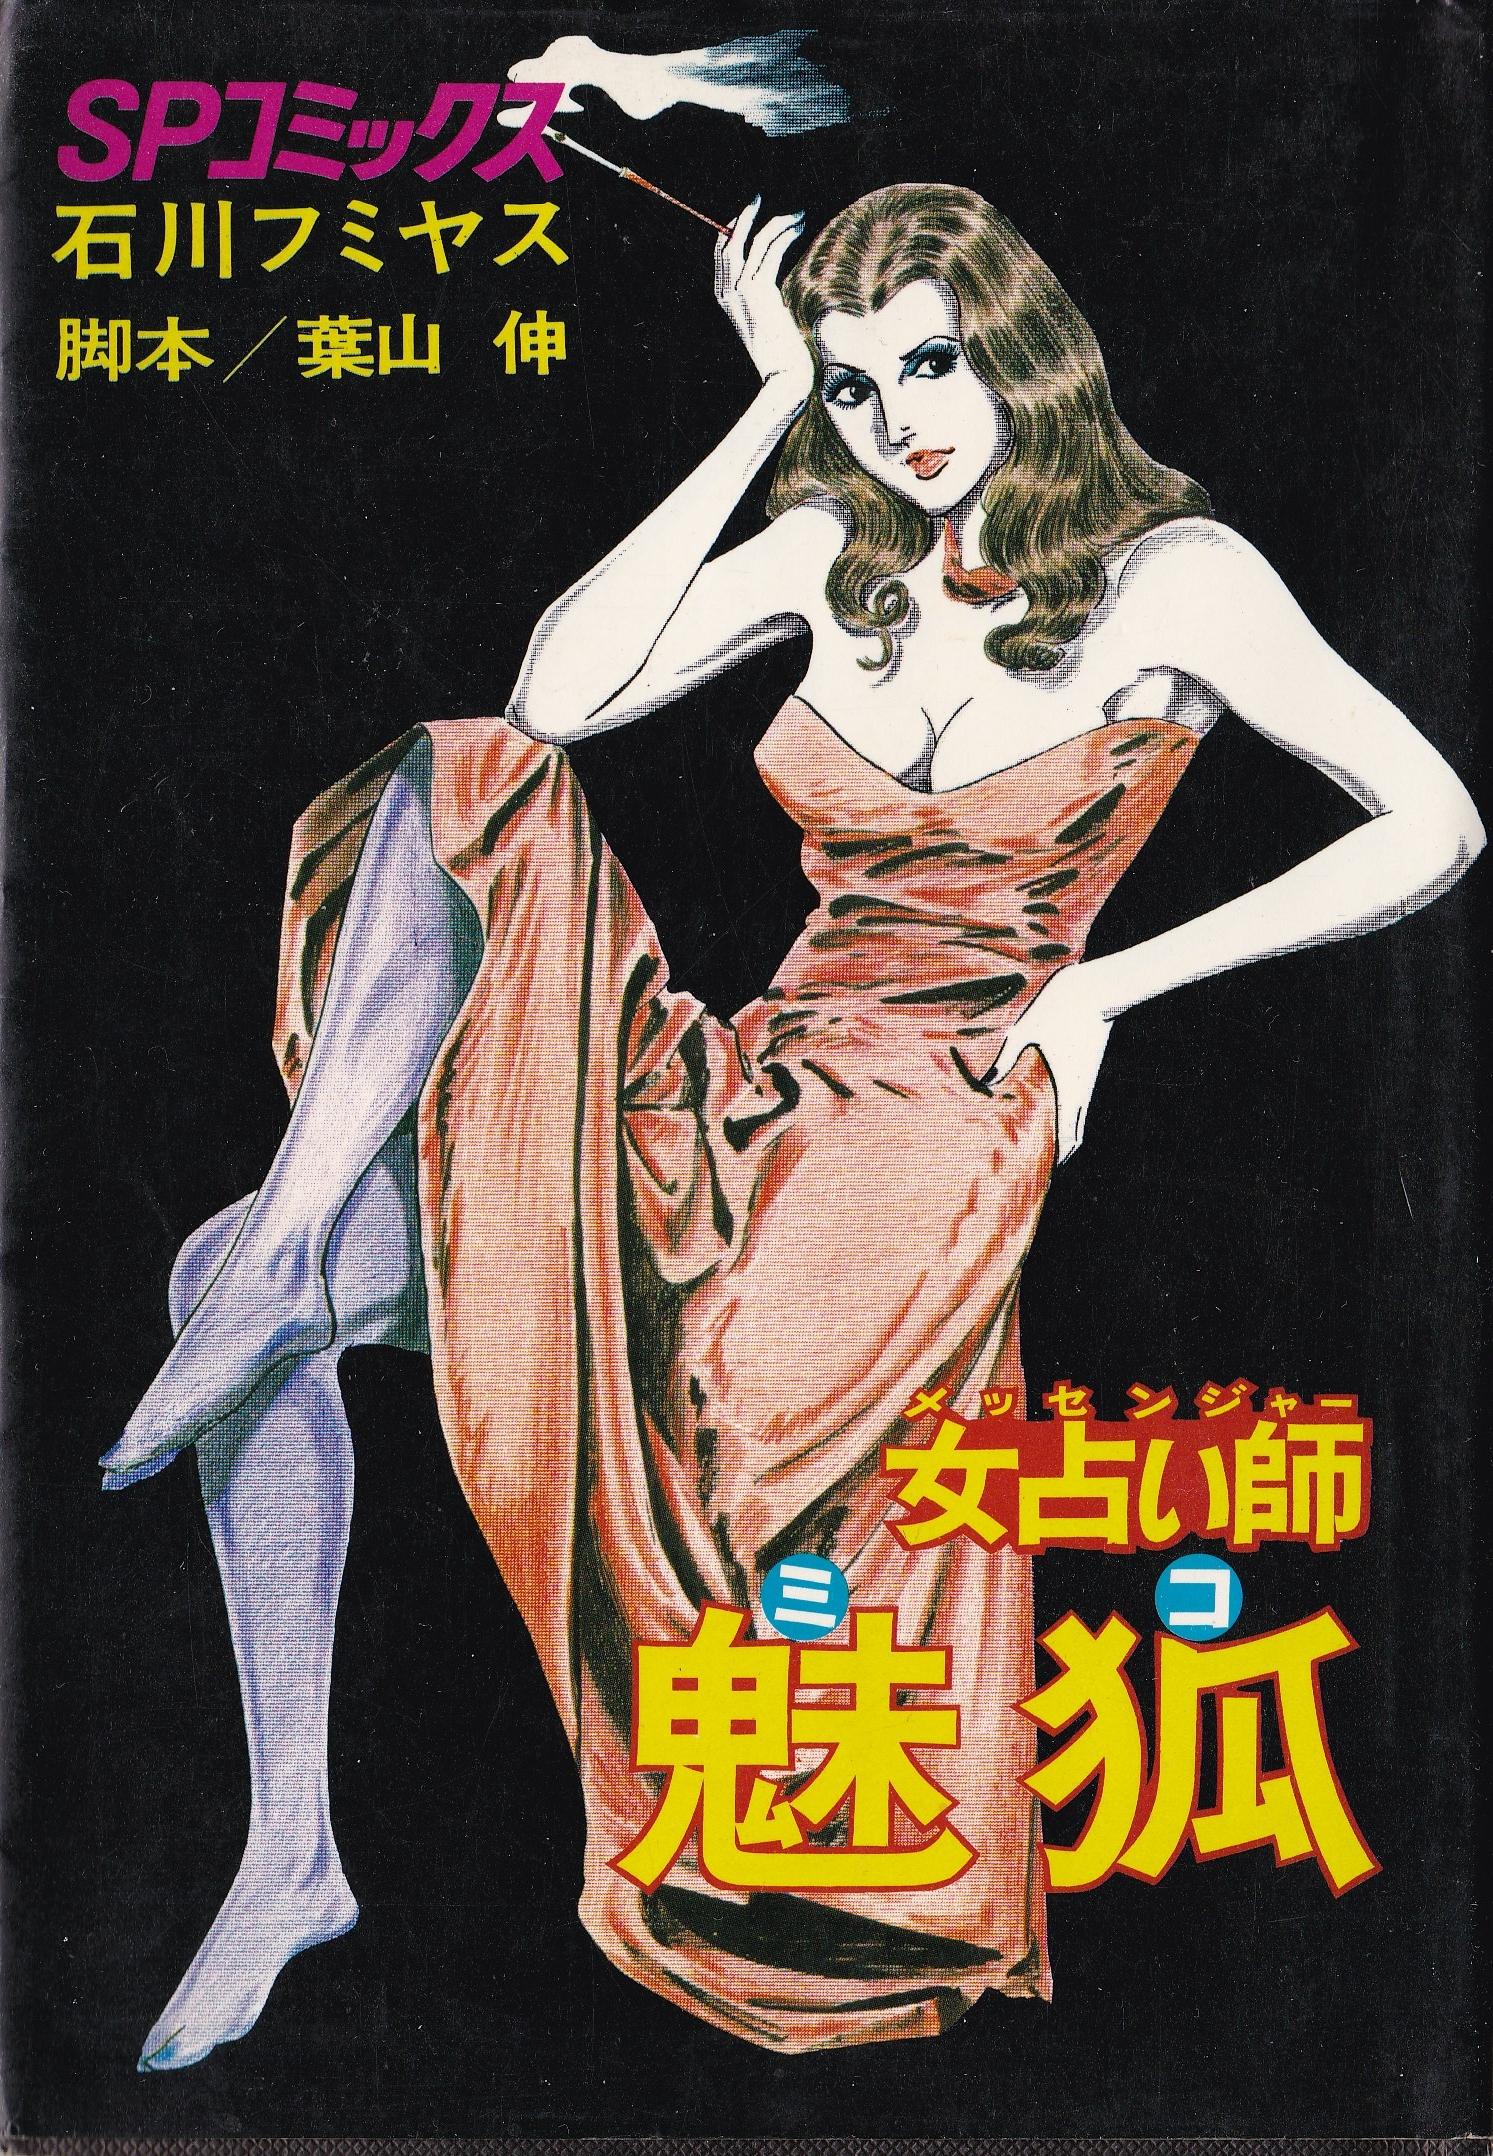 「女占い師魅狐」単行本表紙。